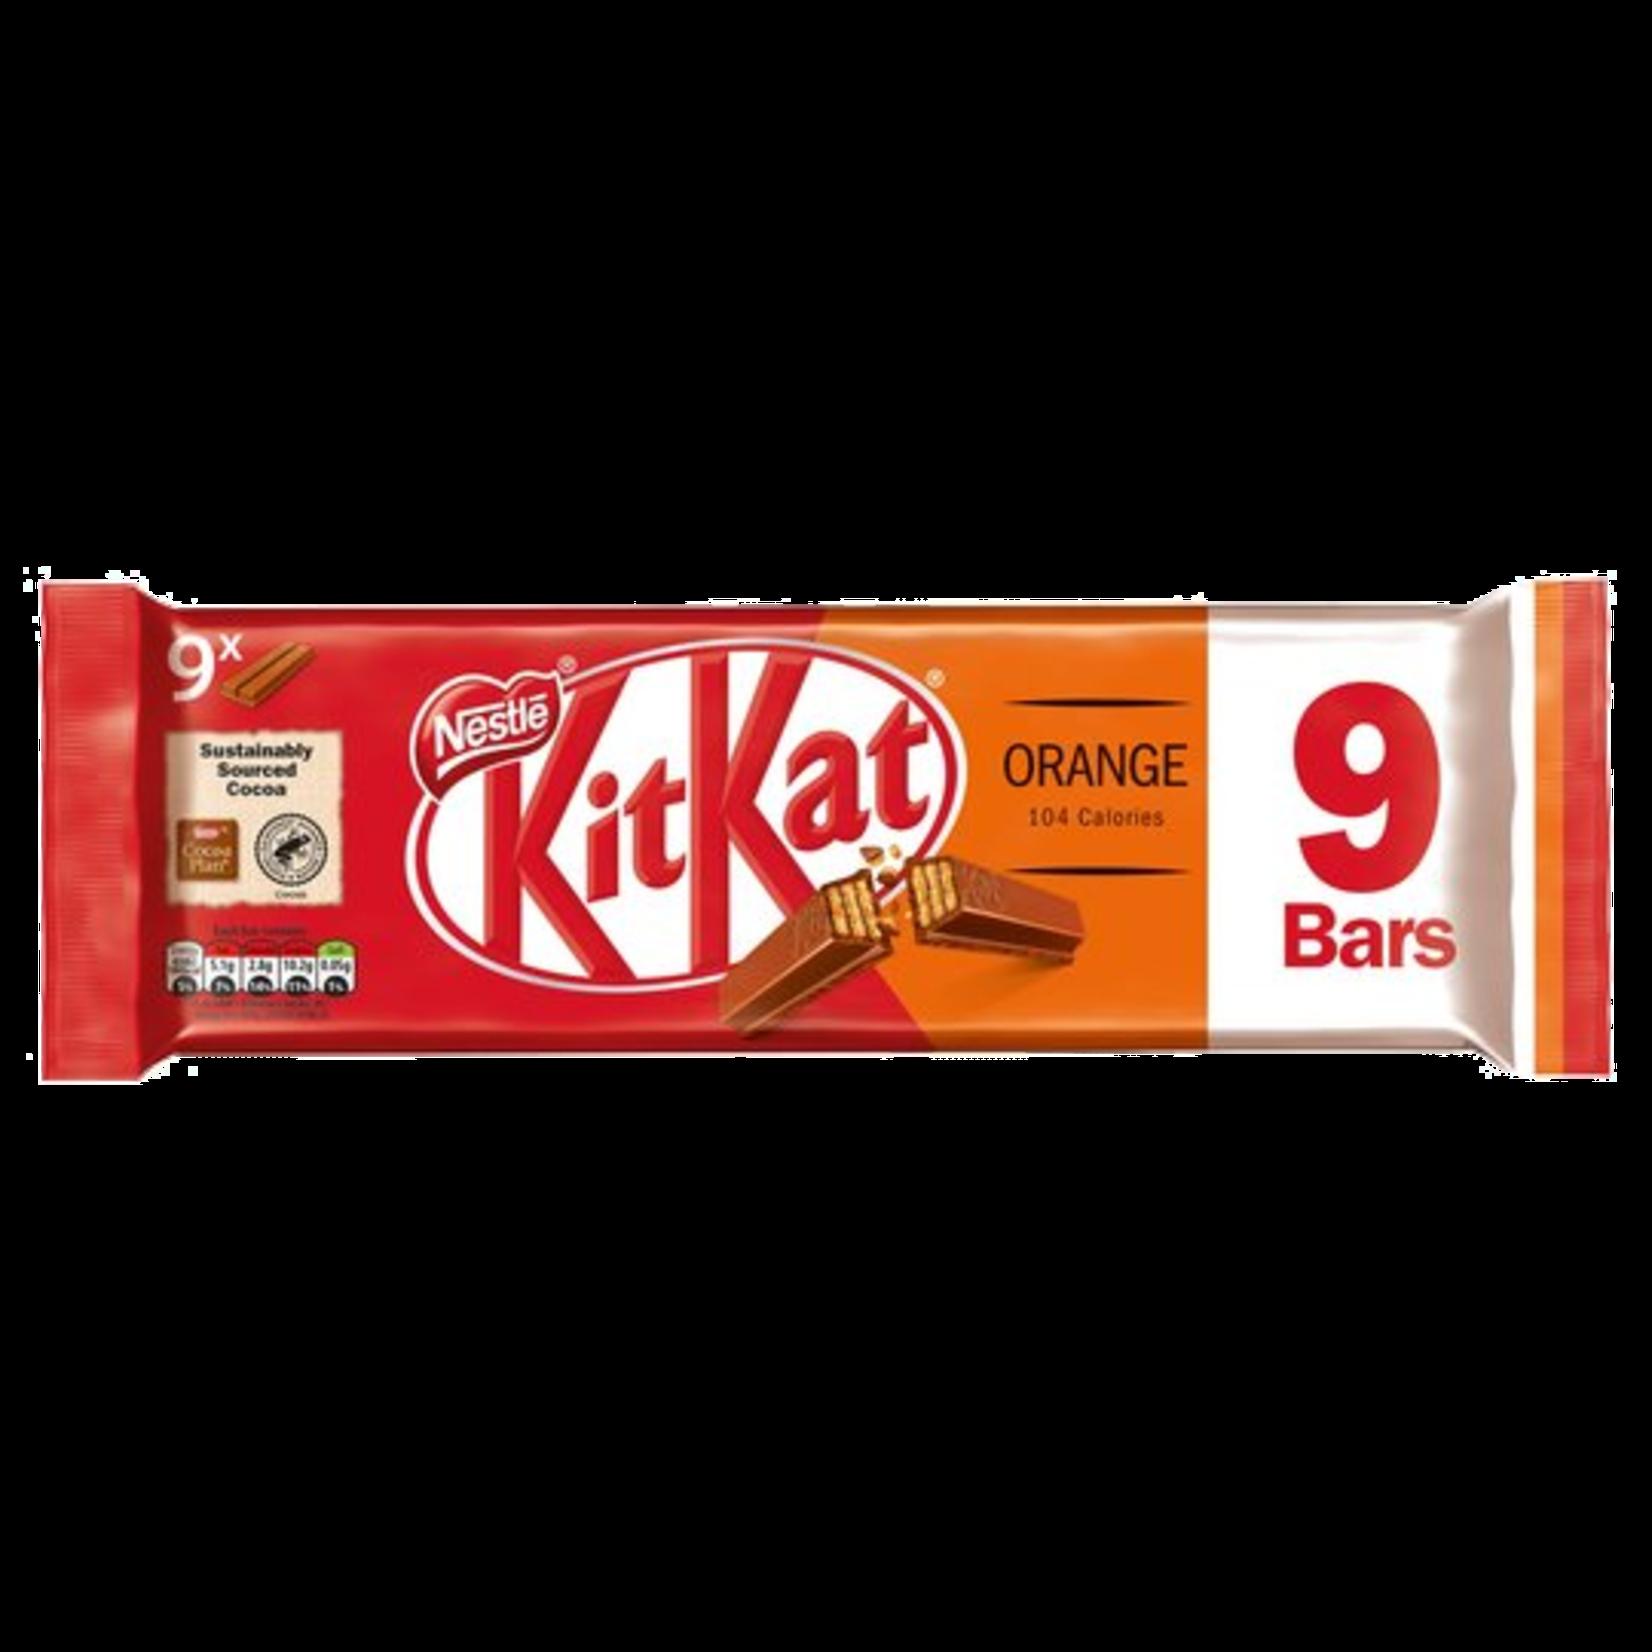 Kit Kat Orange, 9-pack, 9x20.7g